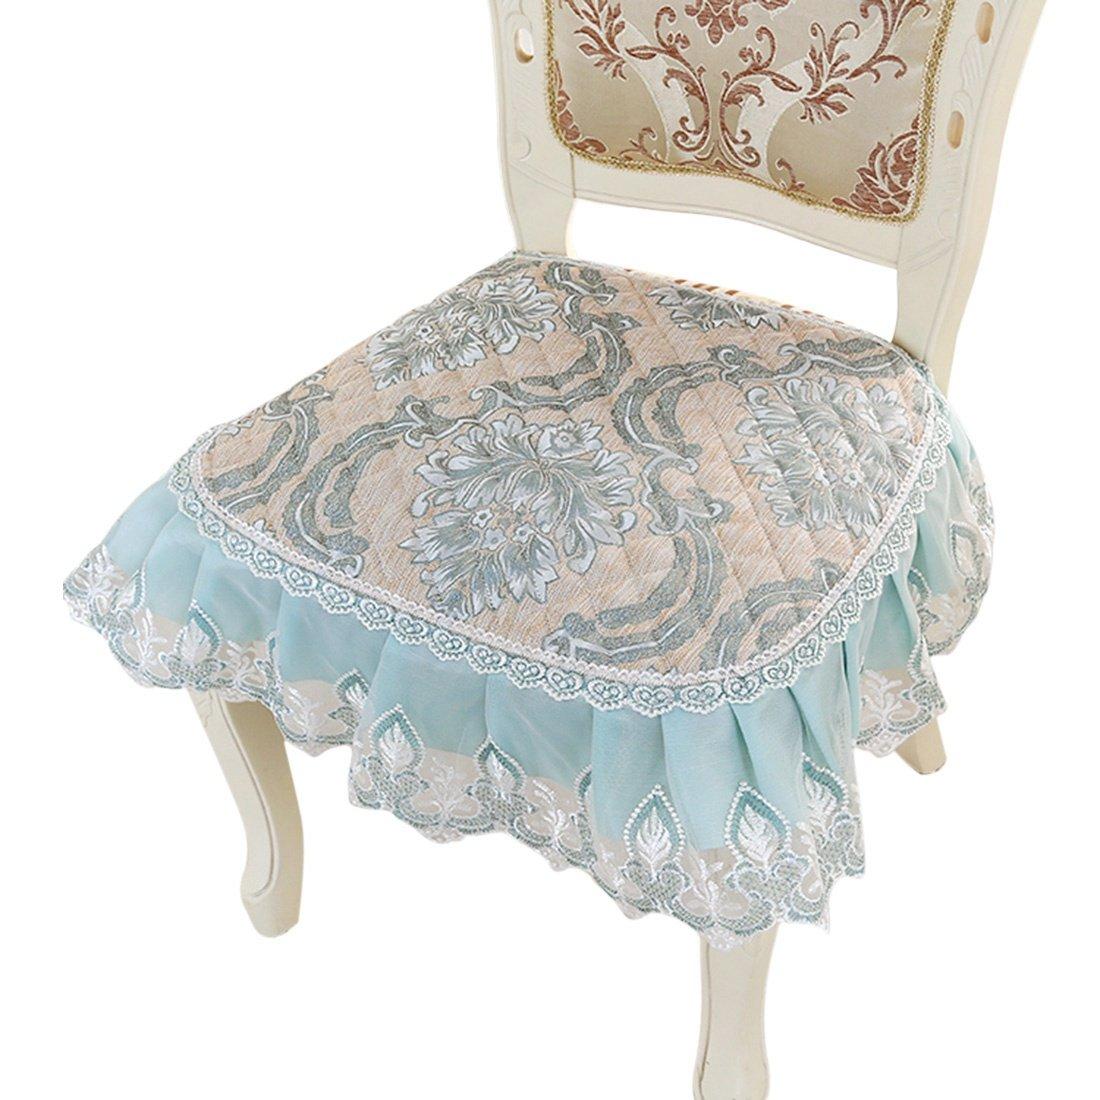 Jiyaru Floral Chair Pad Dining Room Home Garden Office Soft Seat Cushion 16''x19'' 1# by Jiyaru